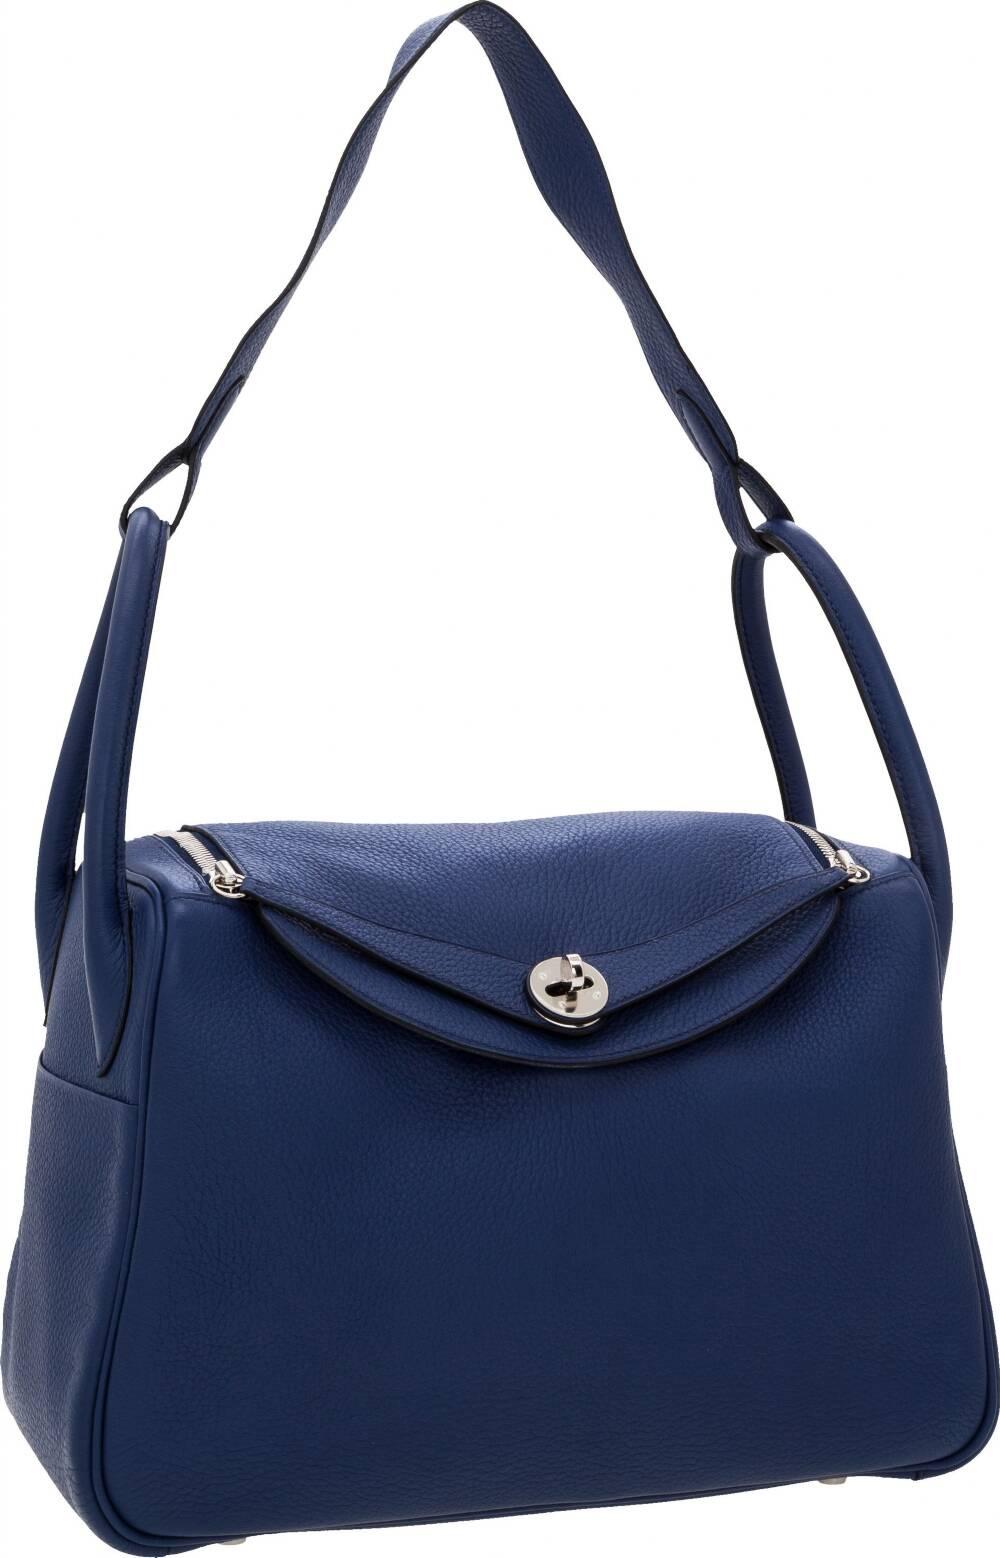 bade391ddf1 The Beautiful Hermes Handbag   Hermes Bag